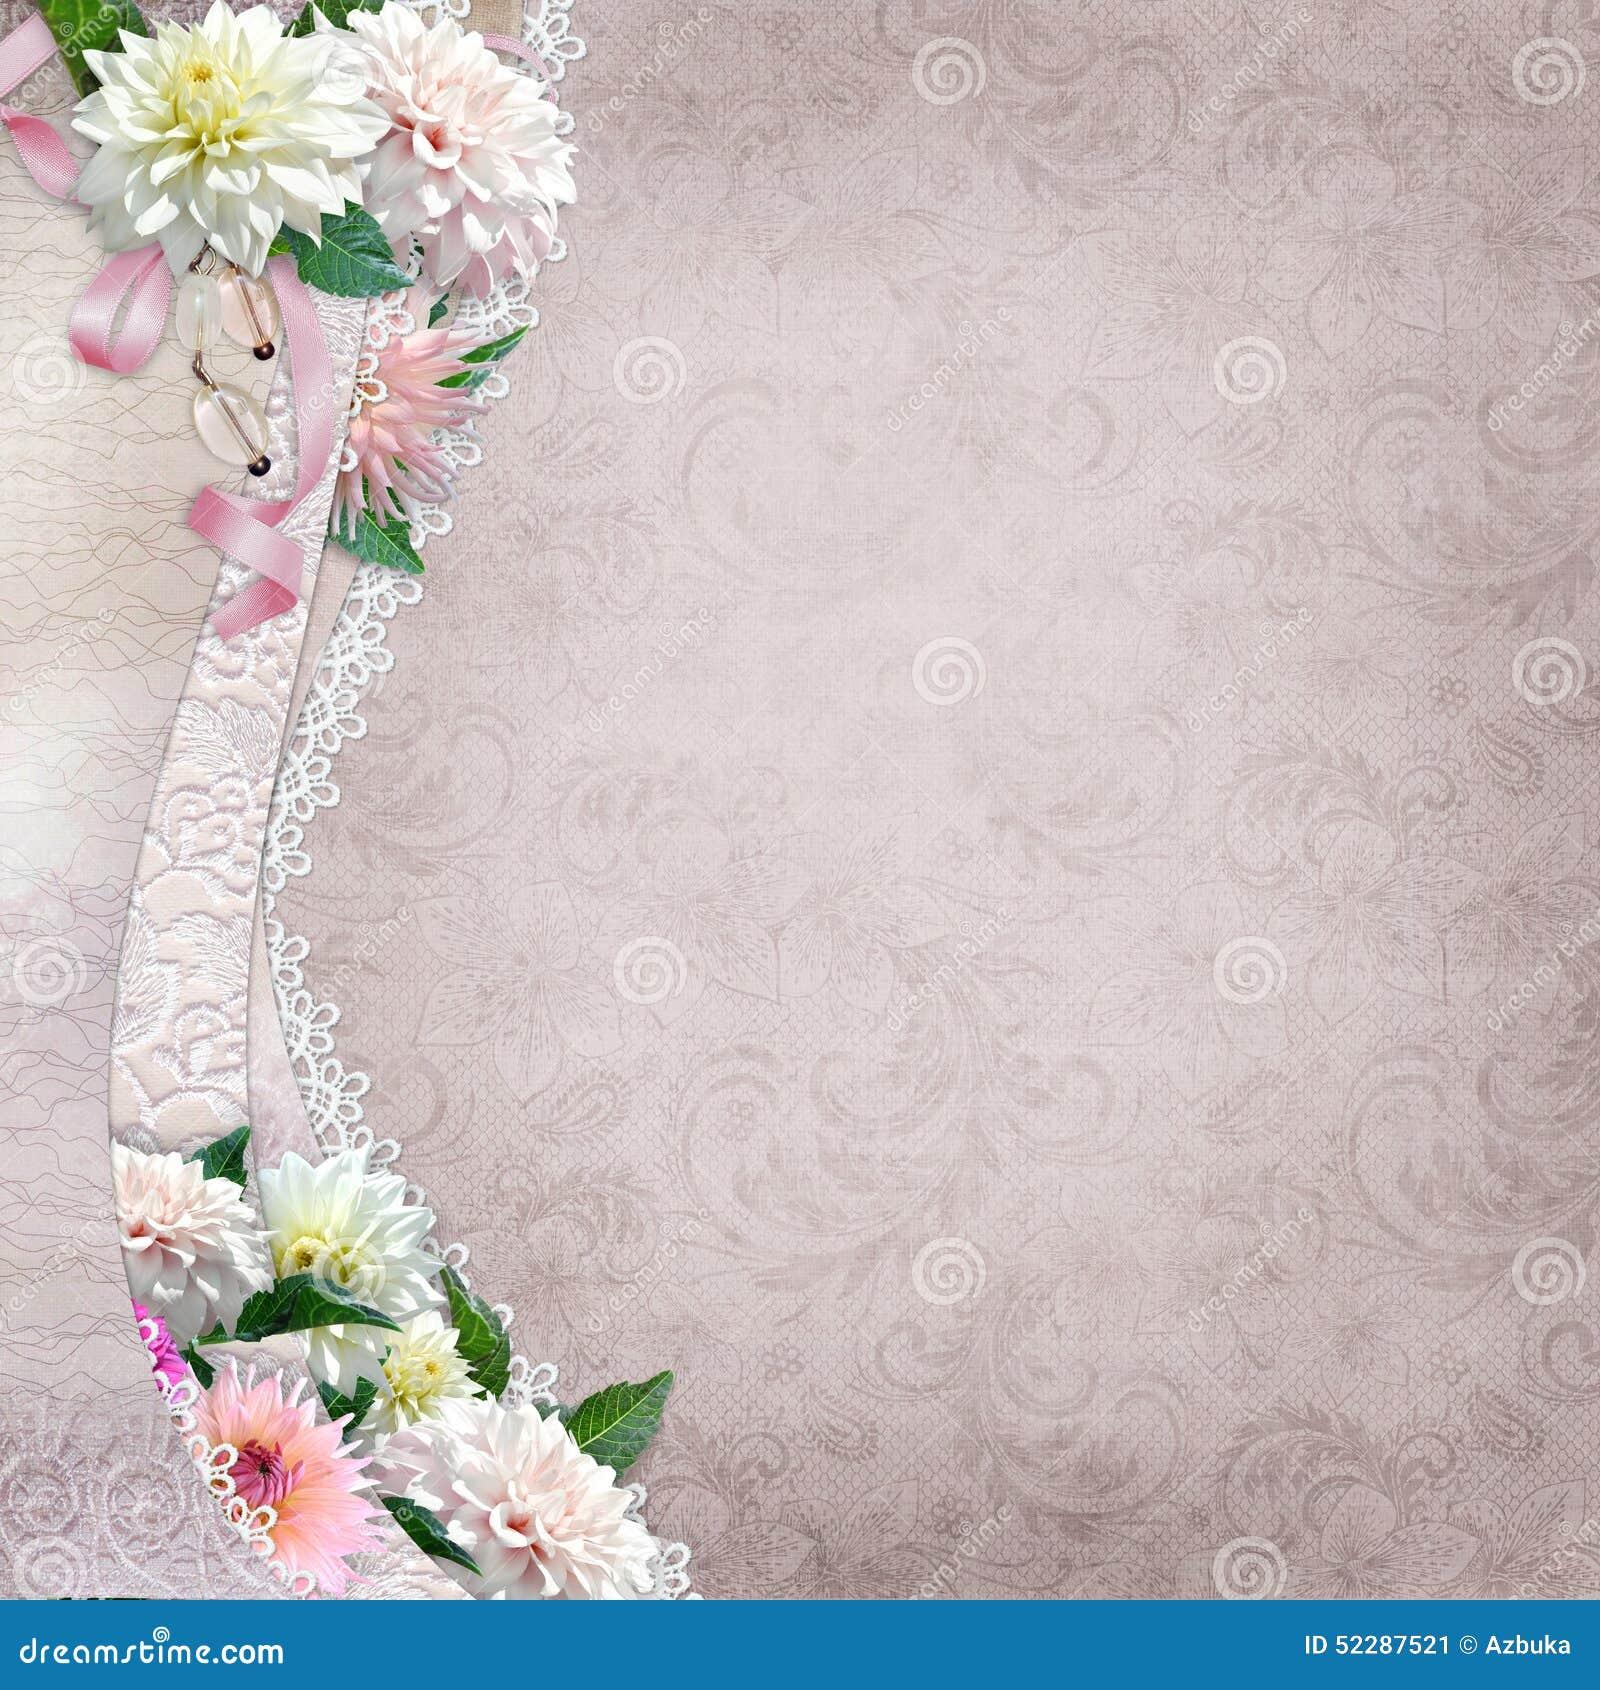 Vintage Pink Lace Flowers Dress Images